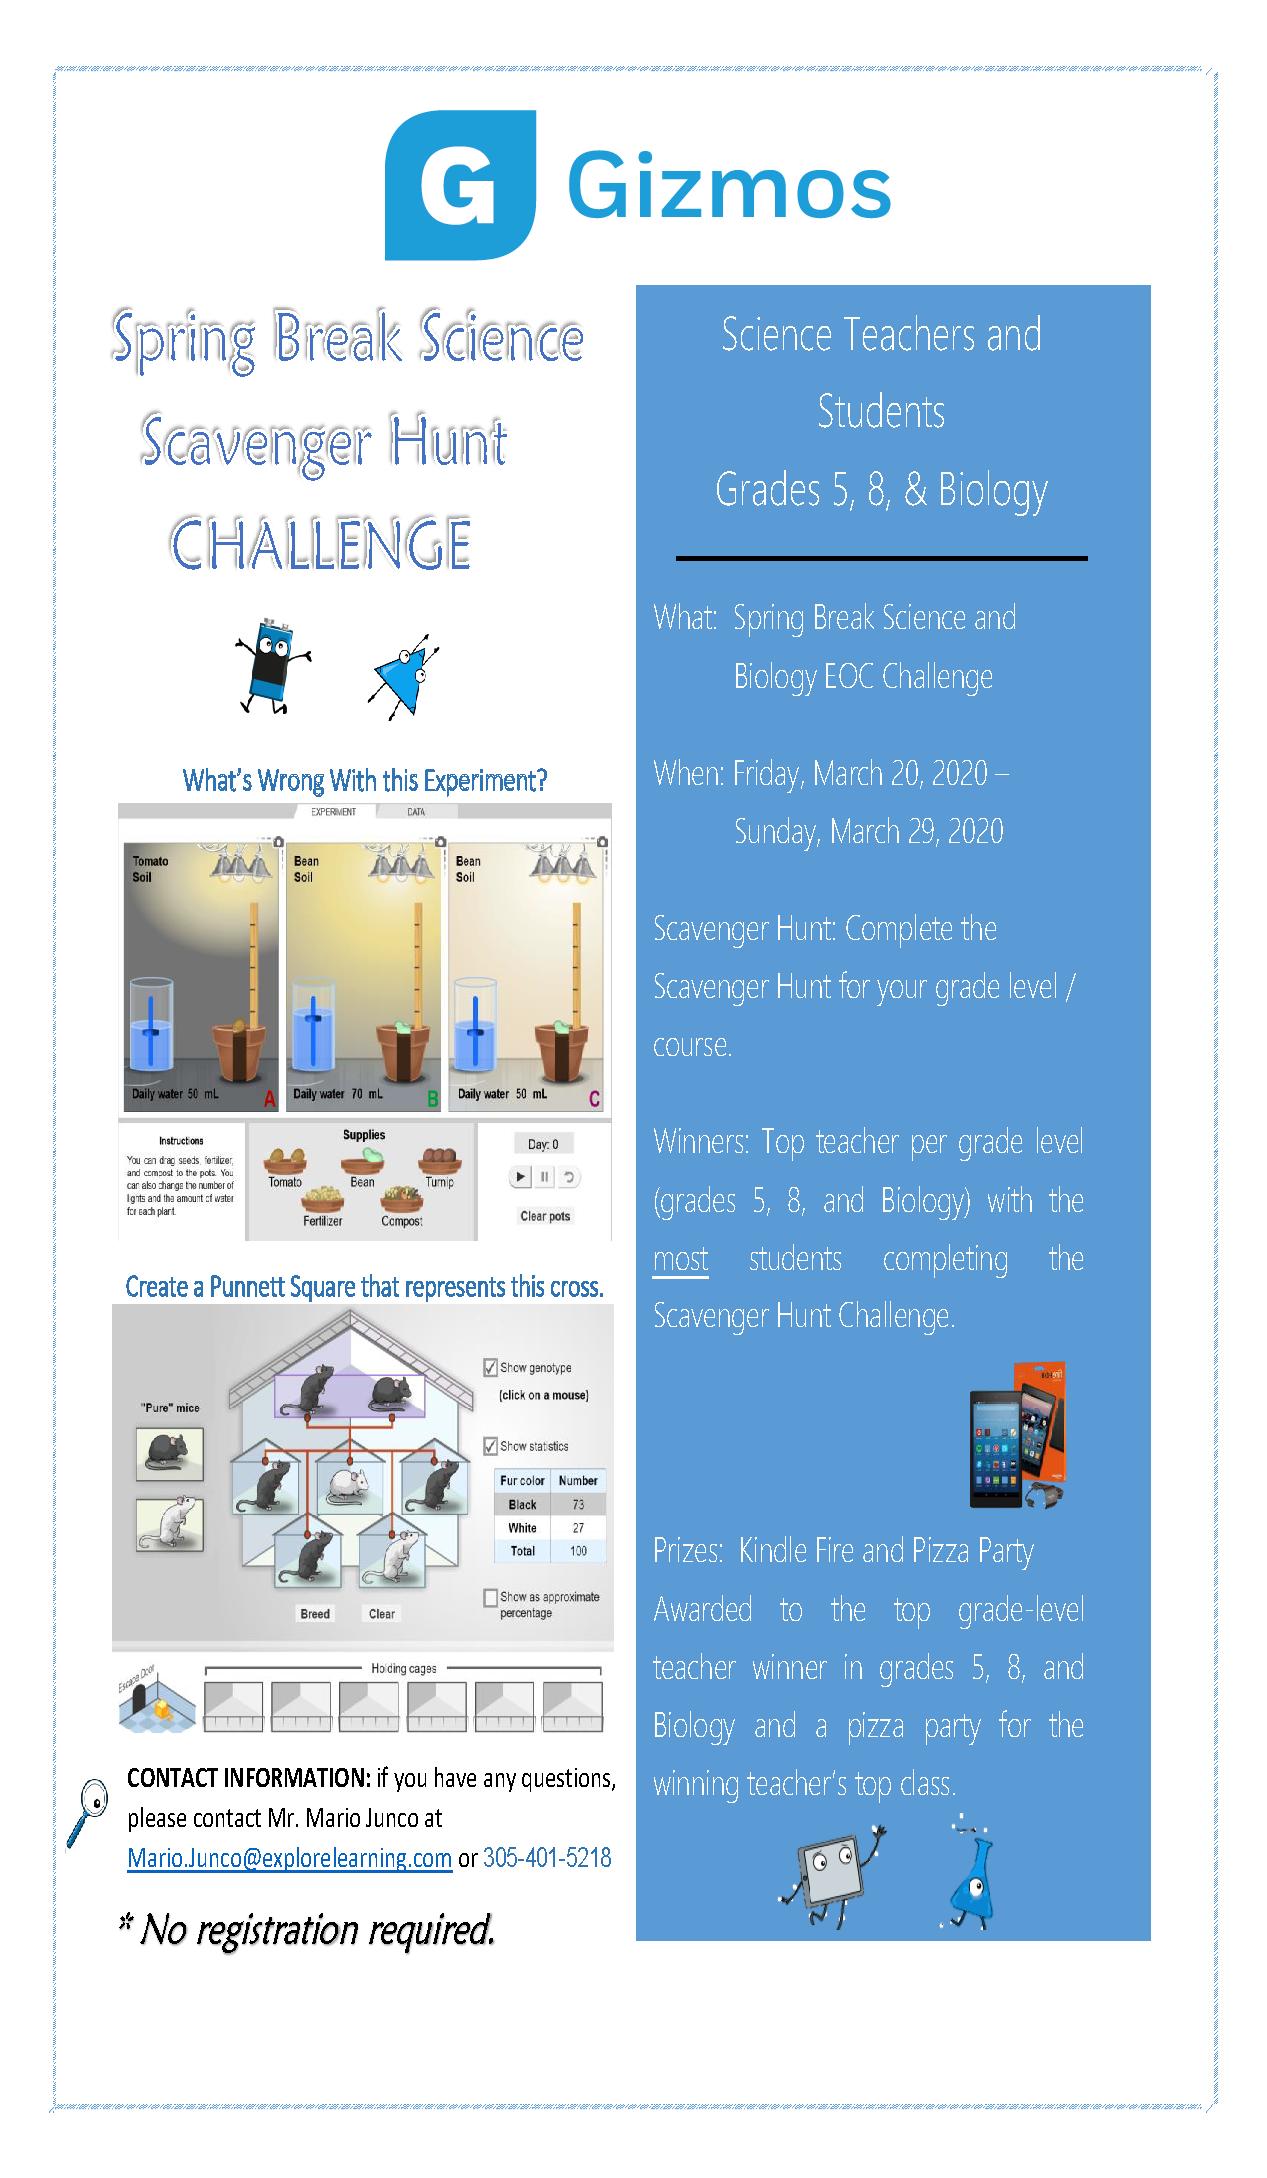 Gizmos Spring Break Science Scavenger Hunt Challenge Flyer